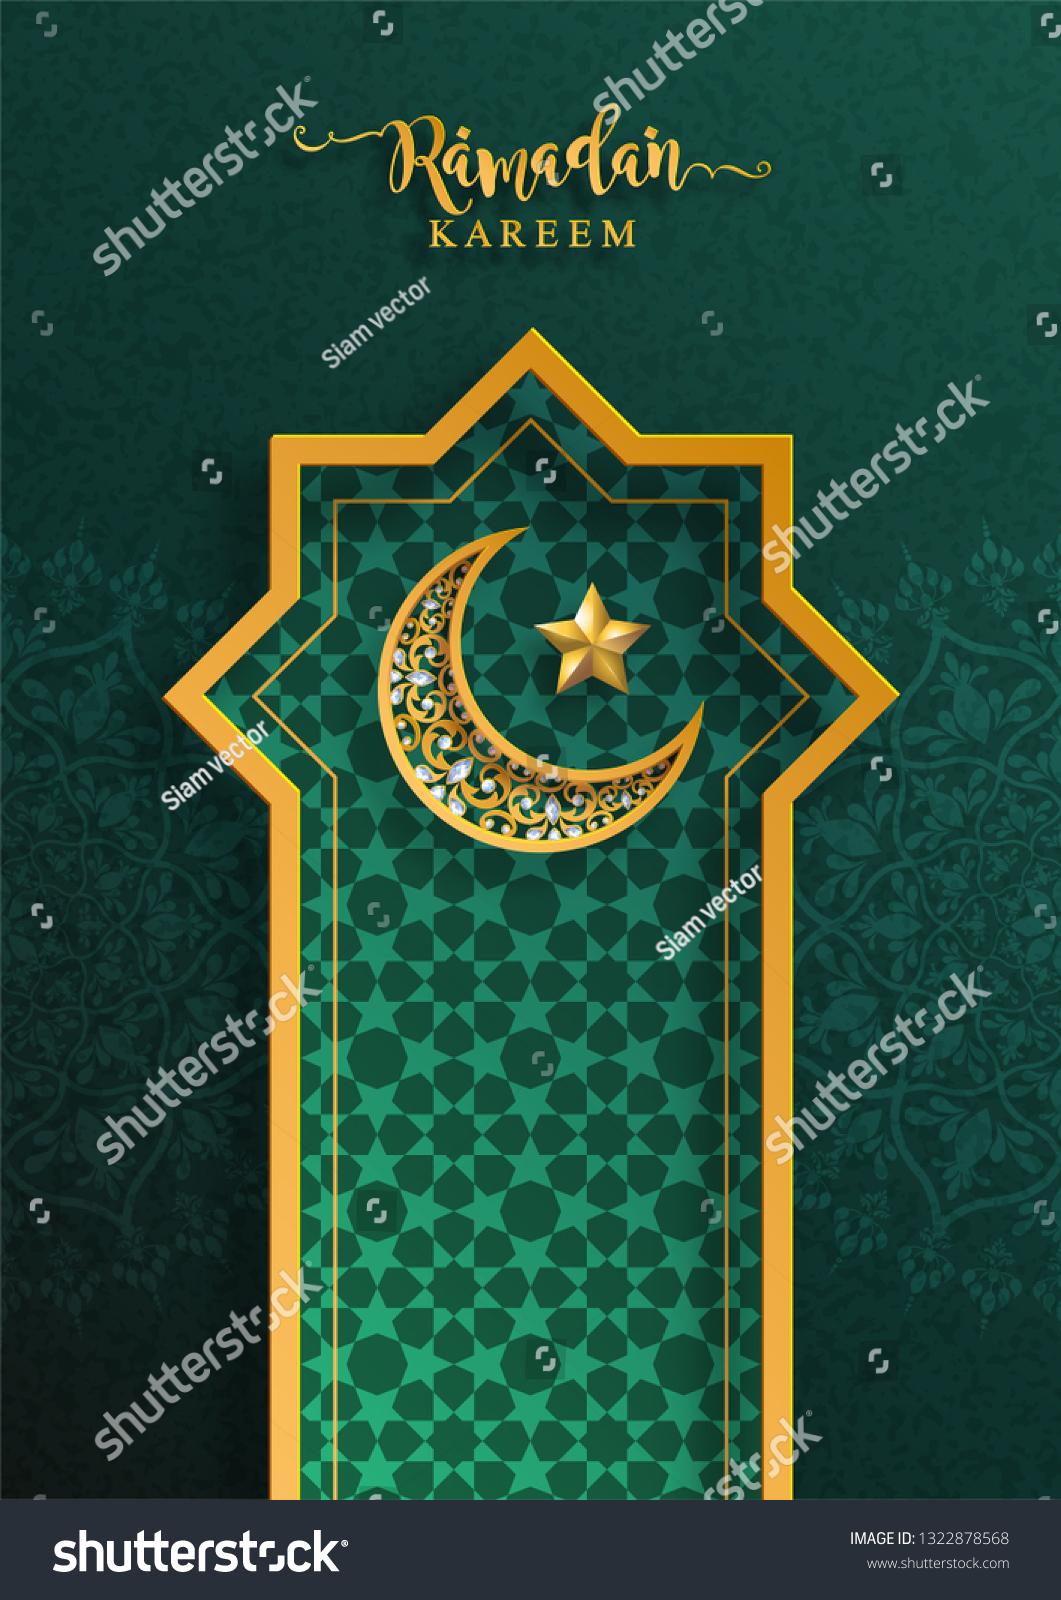 2019 Ramadan Kareem Background Background Ramadan Kareem